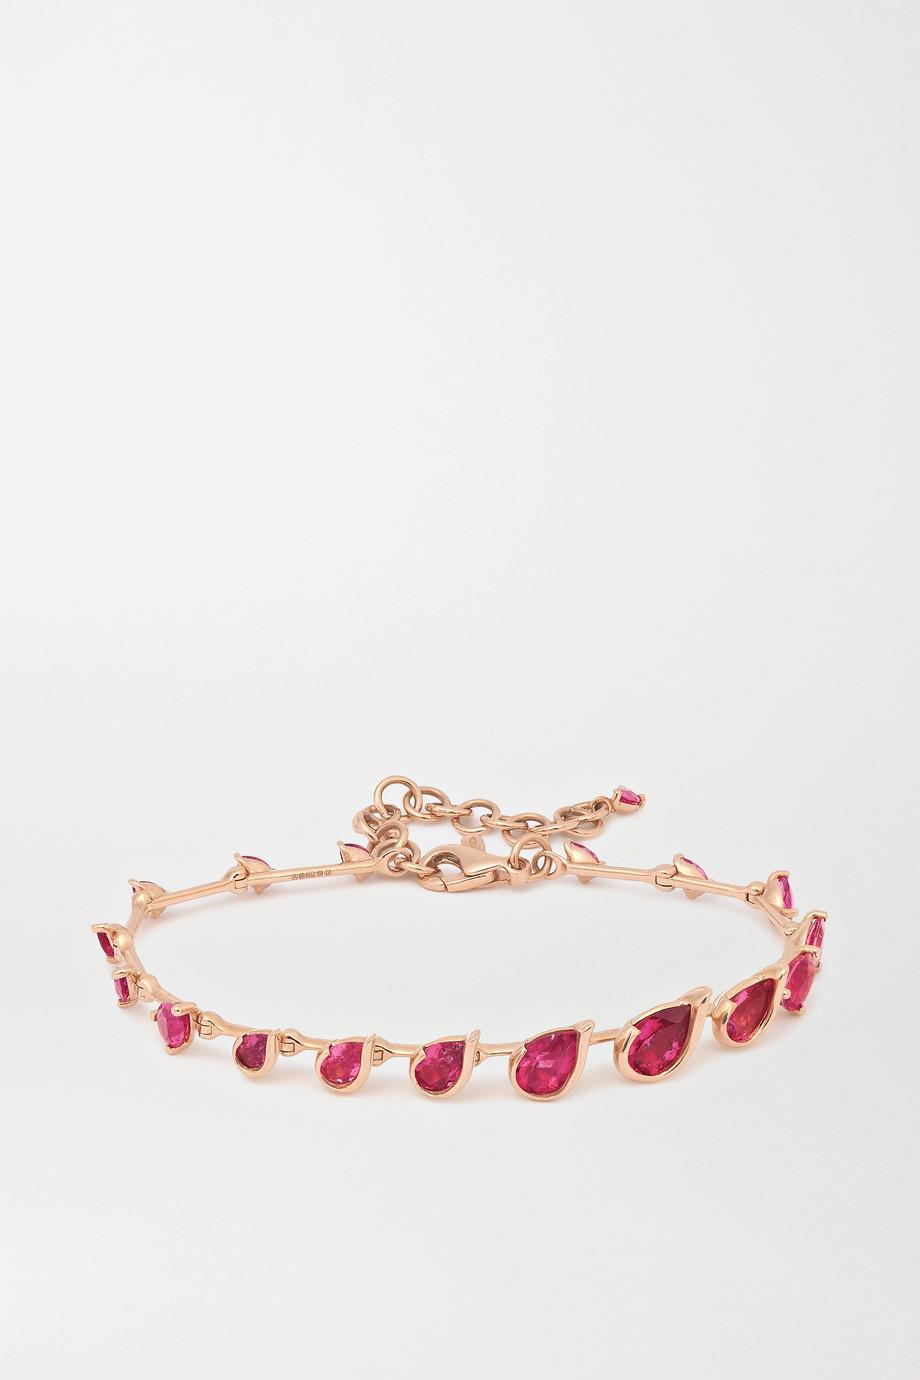 Fernando Jorge Flicker 18-karat rose gold rubellite bracelet